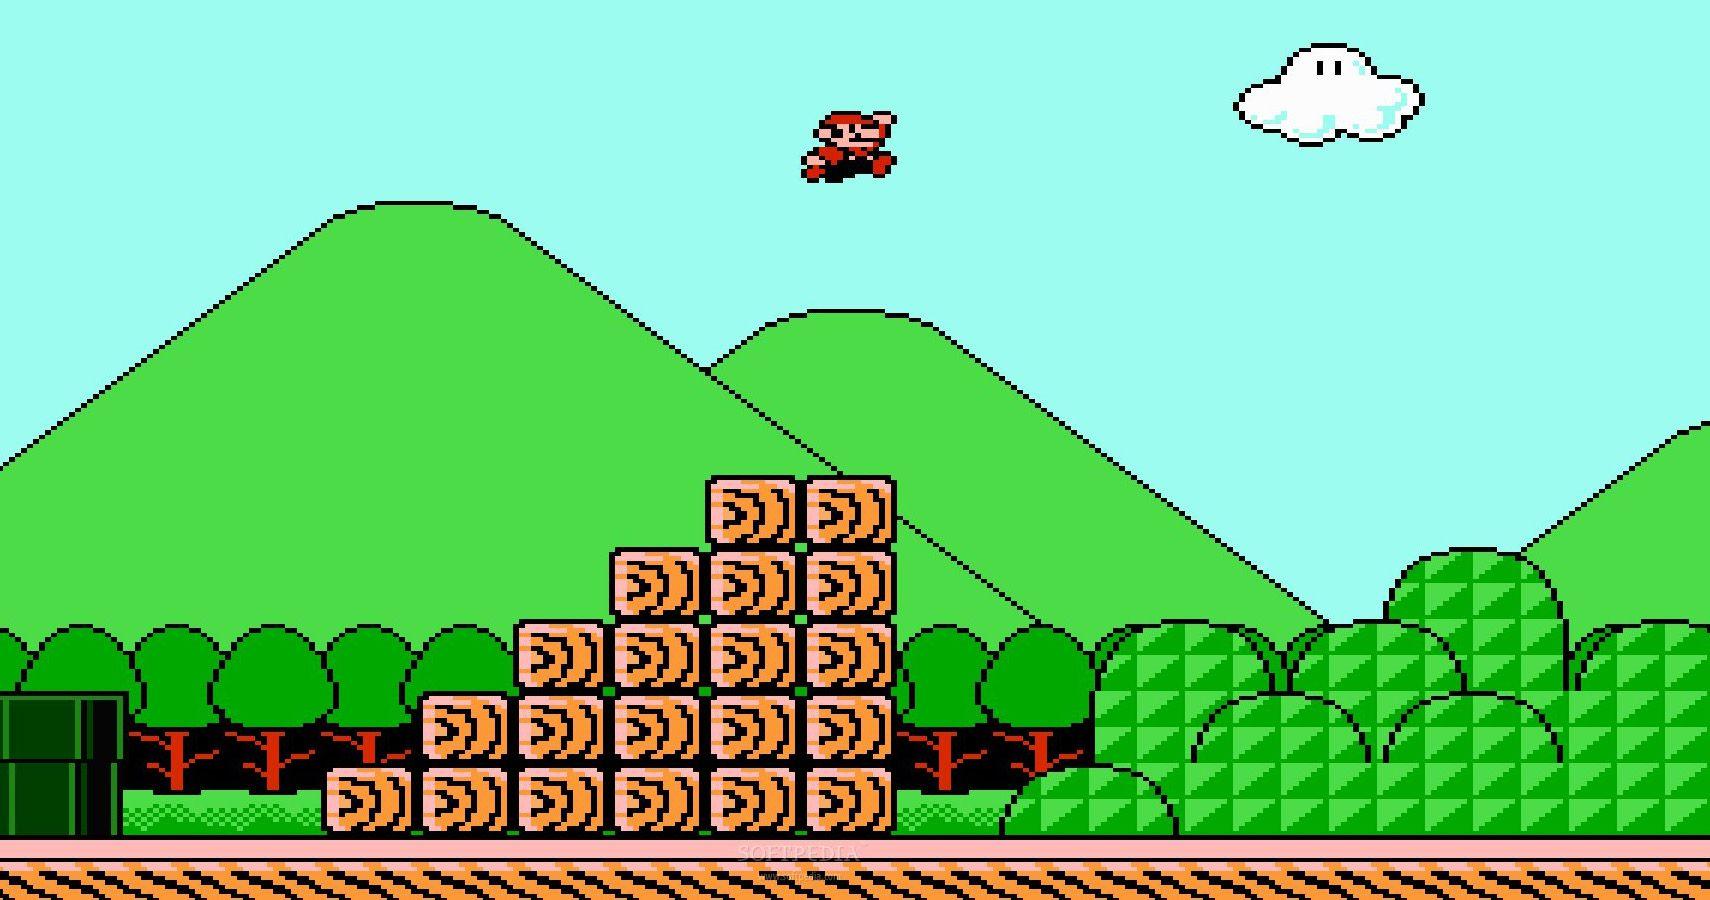 25 Awesome Areas In Super Mario Bros 3 Casuals Had No Idea About